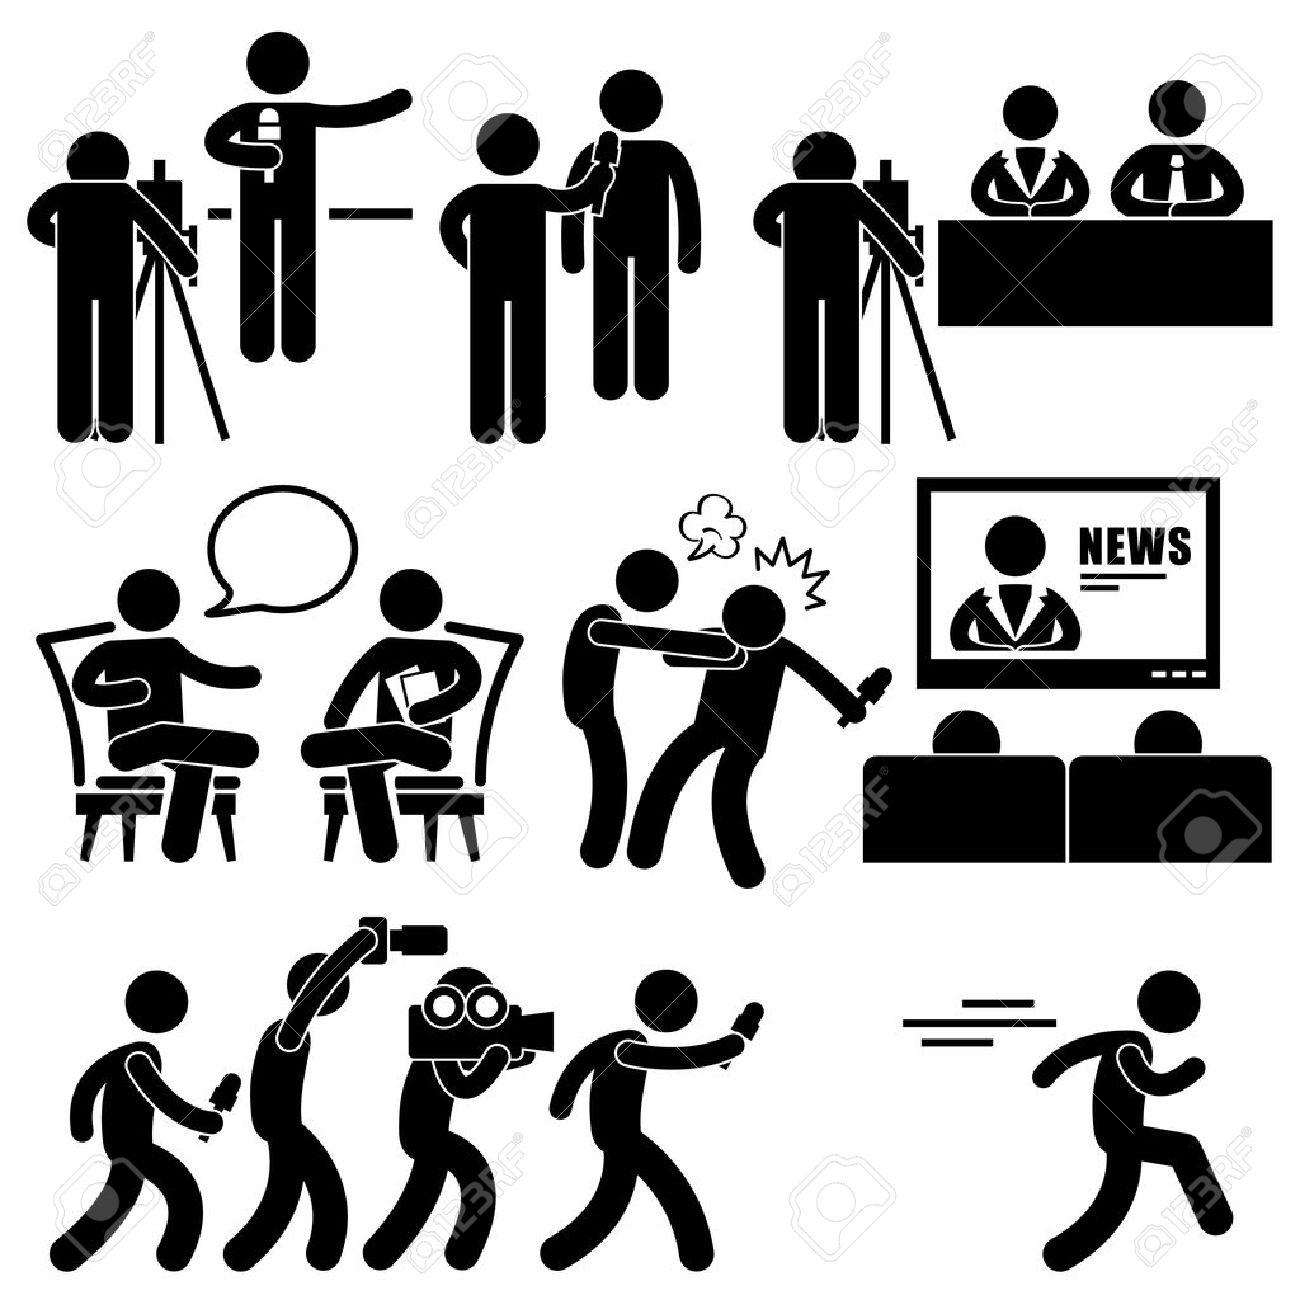 News Reporter Anchor Woman Newsroom Man Talk Show Host Stick Figure Pictogram Icon - 18452153